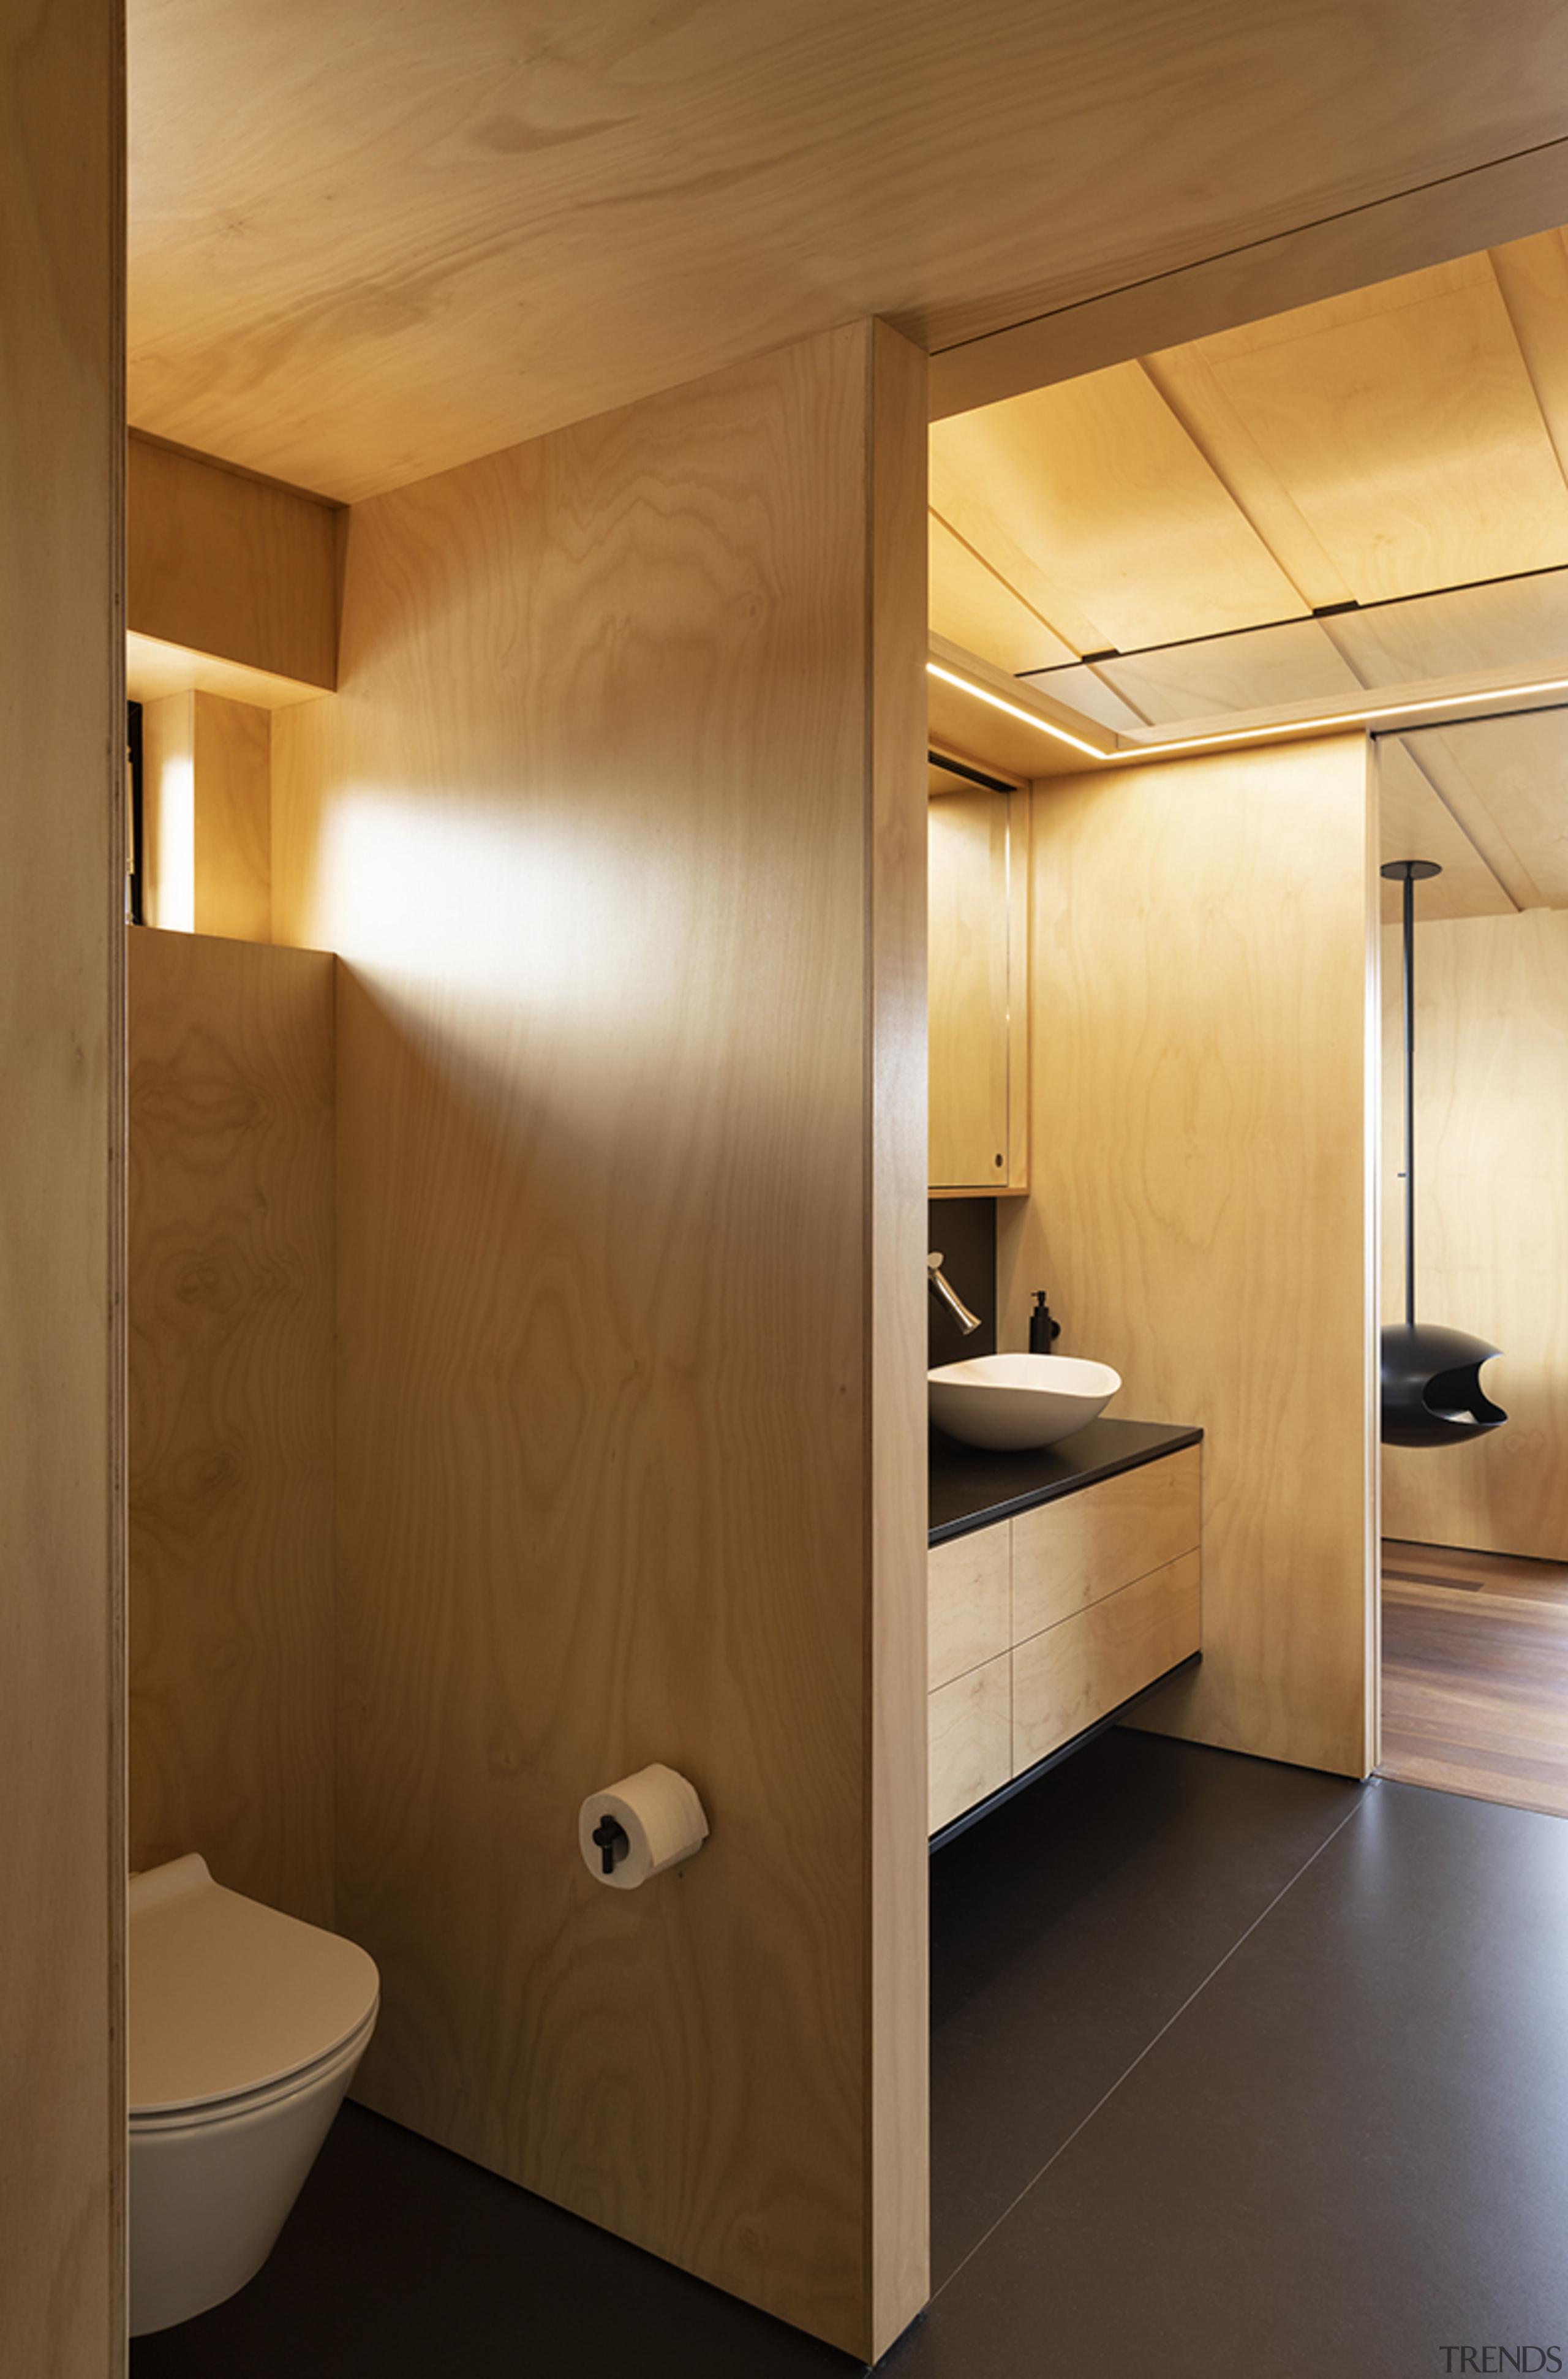 See more of this home. architecture, bathroom, building, ceiling, door, floor, furniture, house, interior design, plumbing fixture, property, room, tile, wall, brown, orange